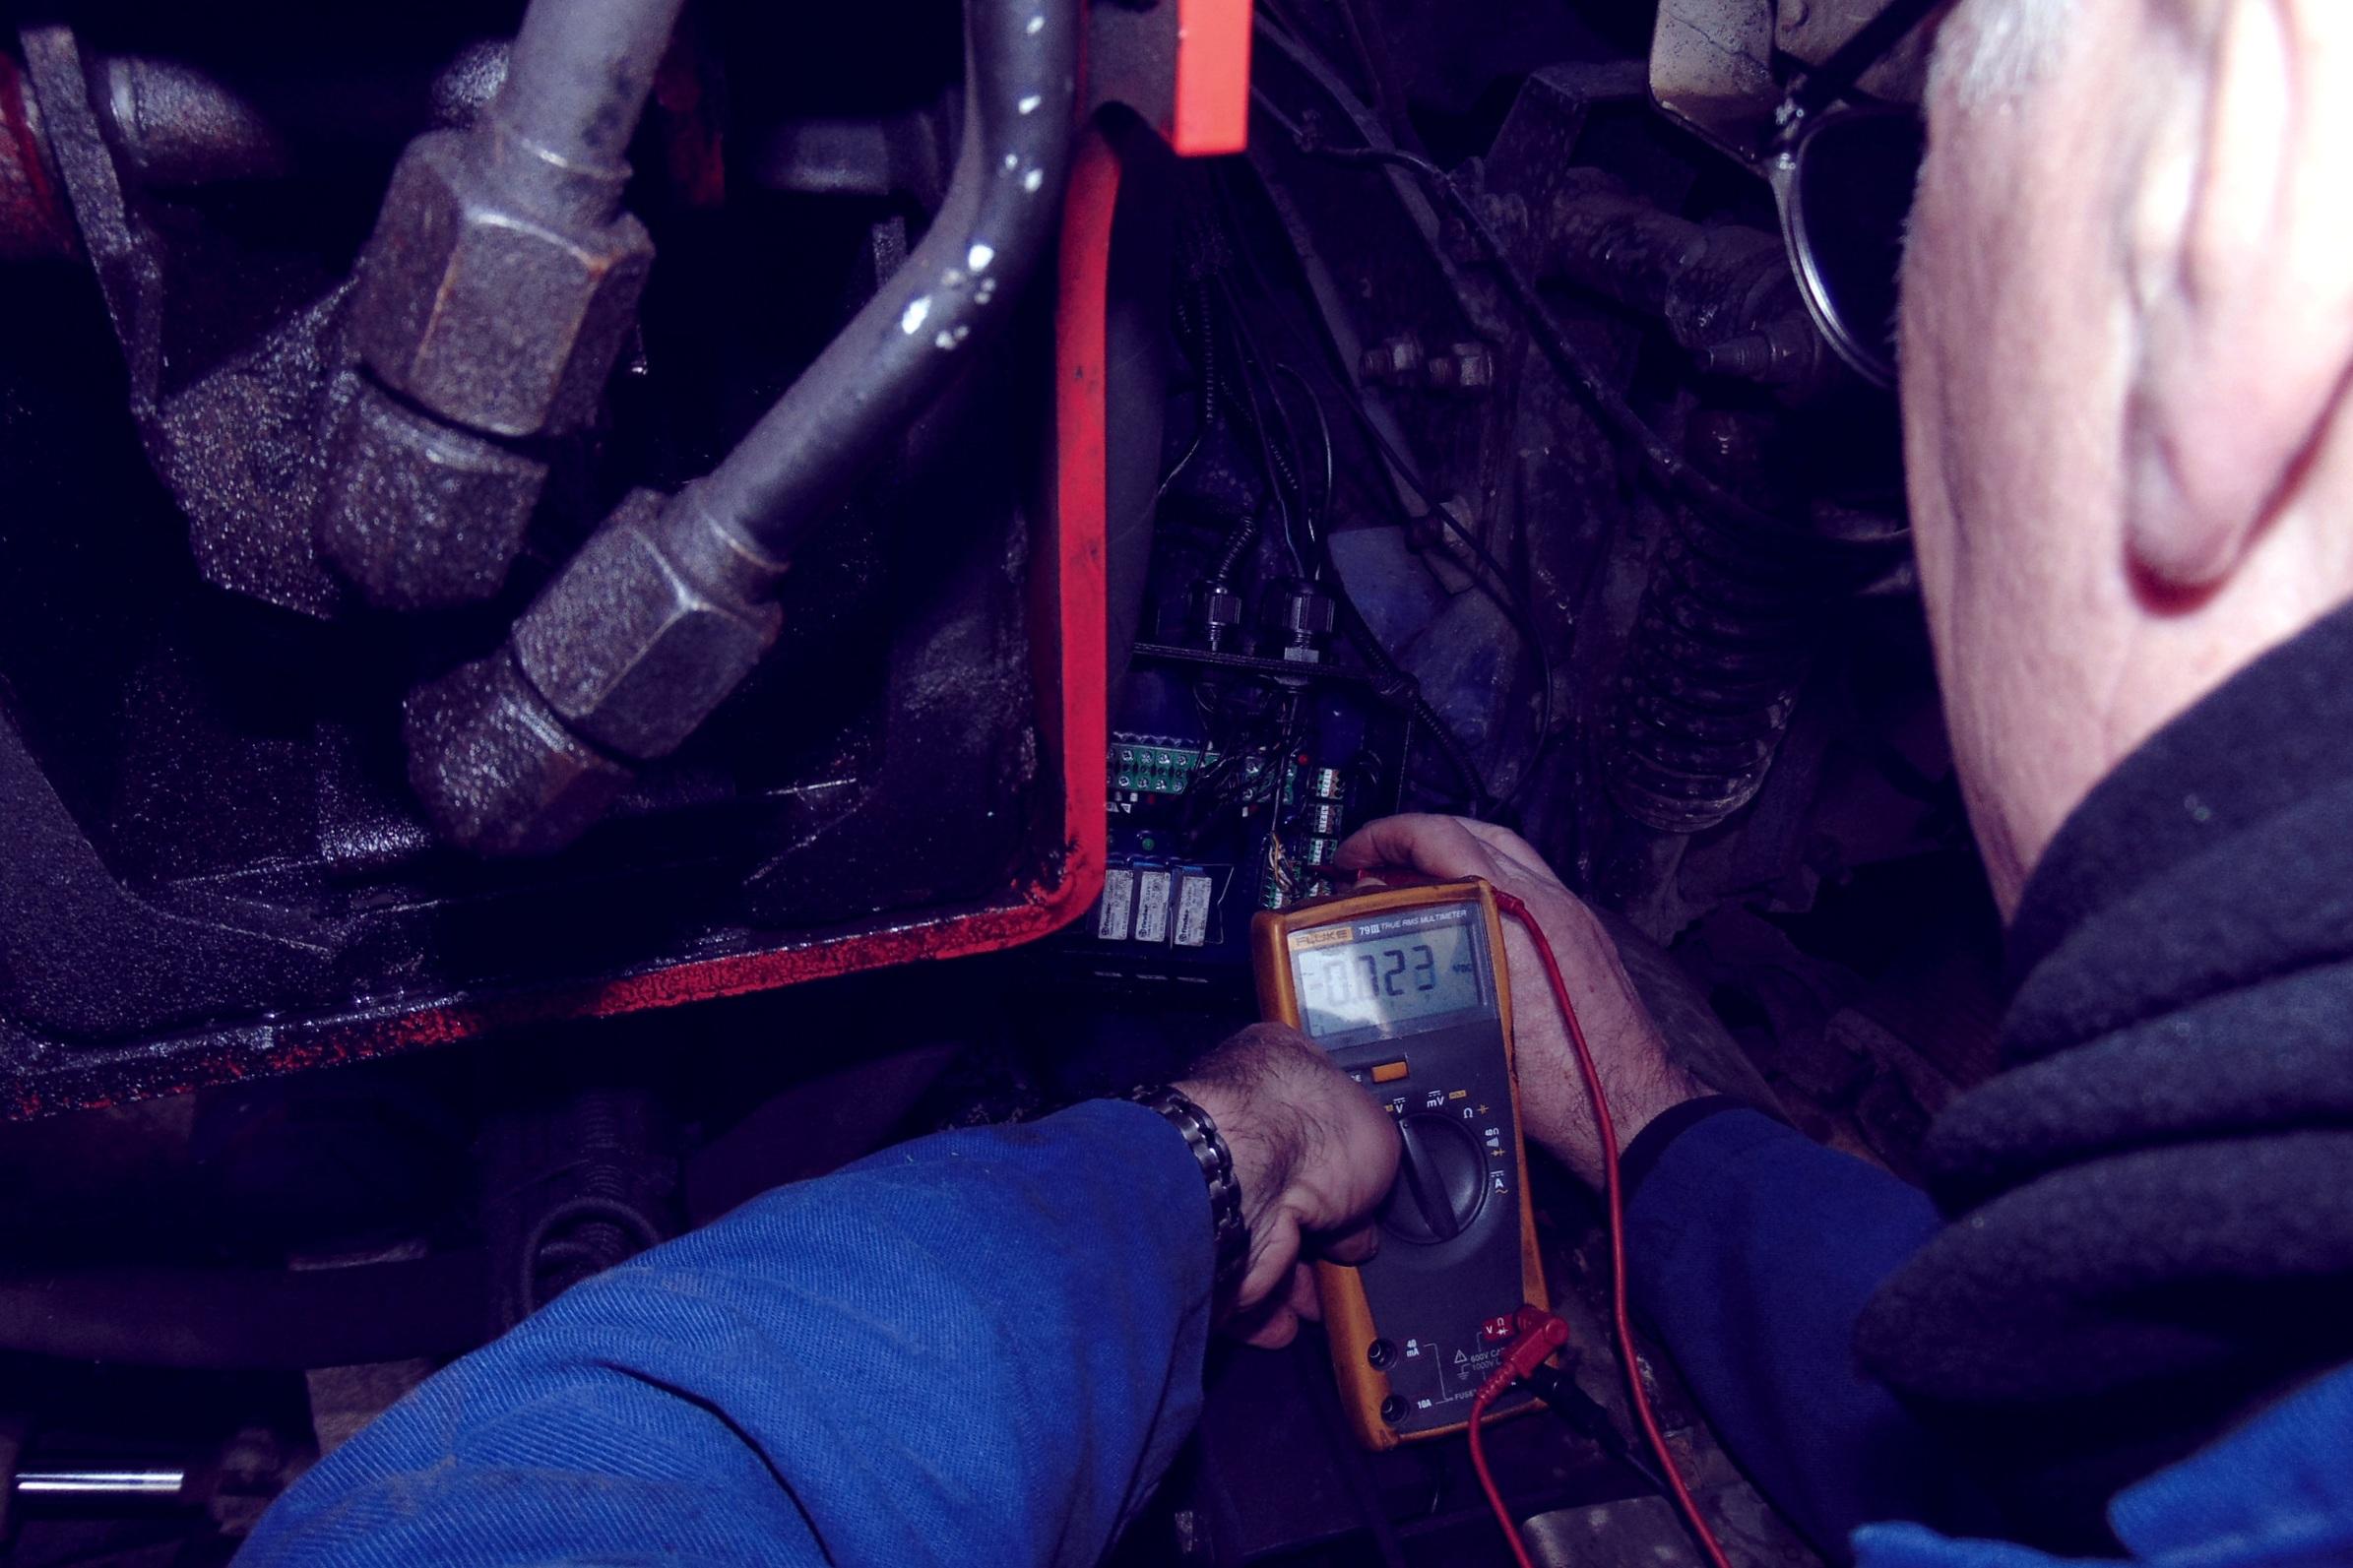 Expert lorry loader service repair in the London & South East (Hiab, Palfinger, Fassi, PM, Atlas, HMF, HYVA etc)